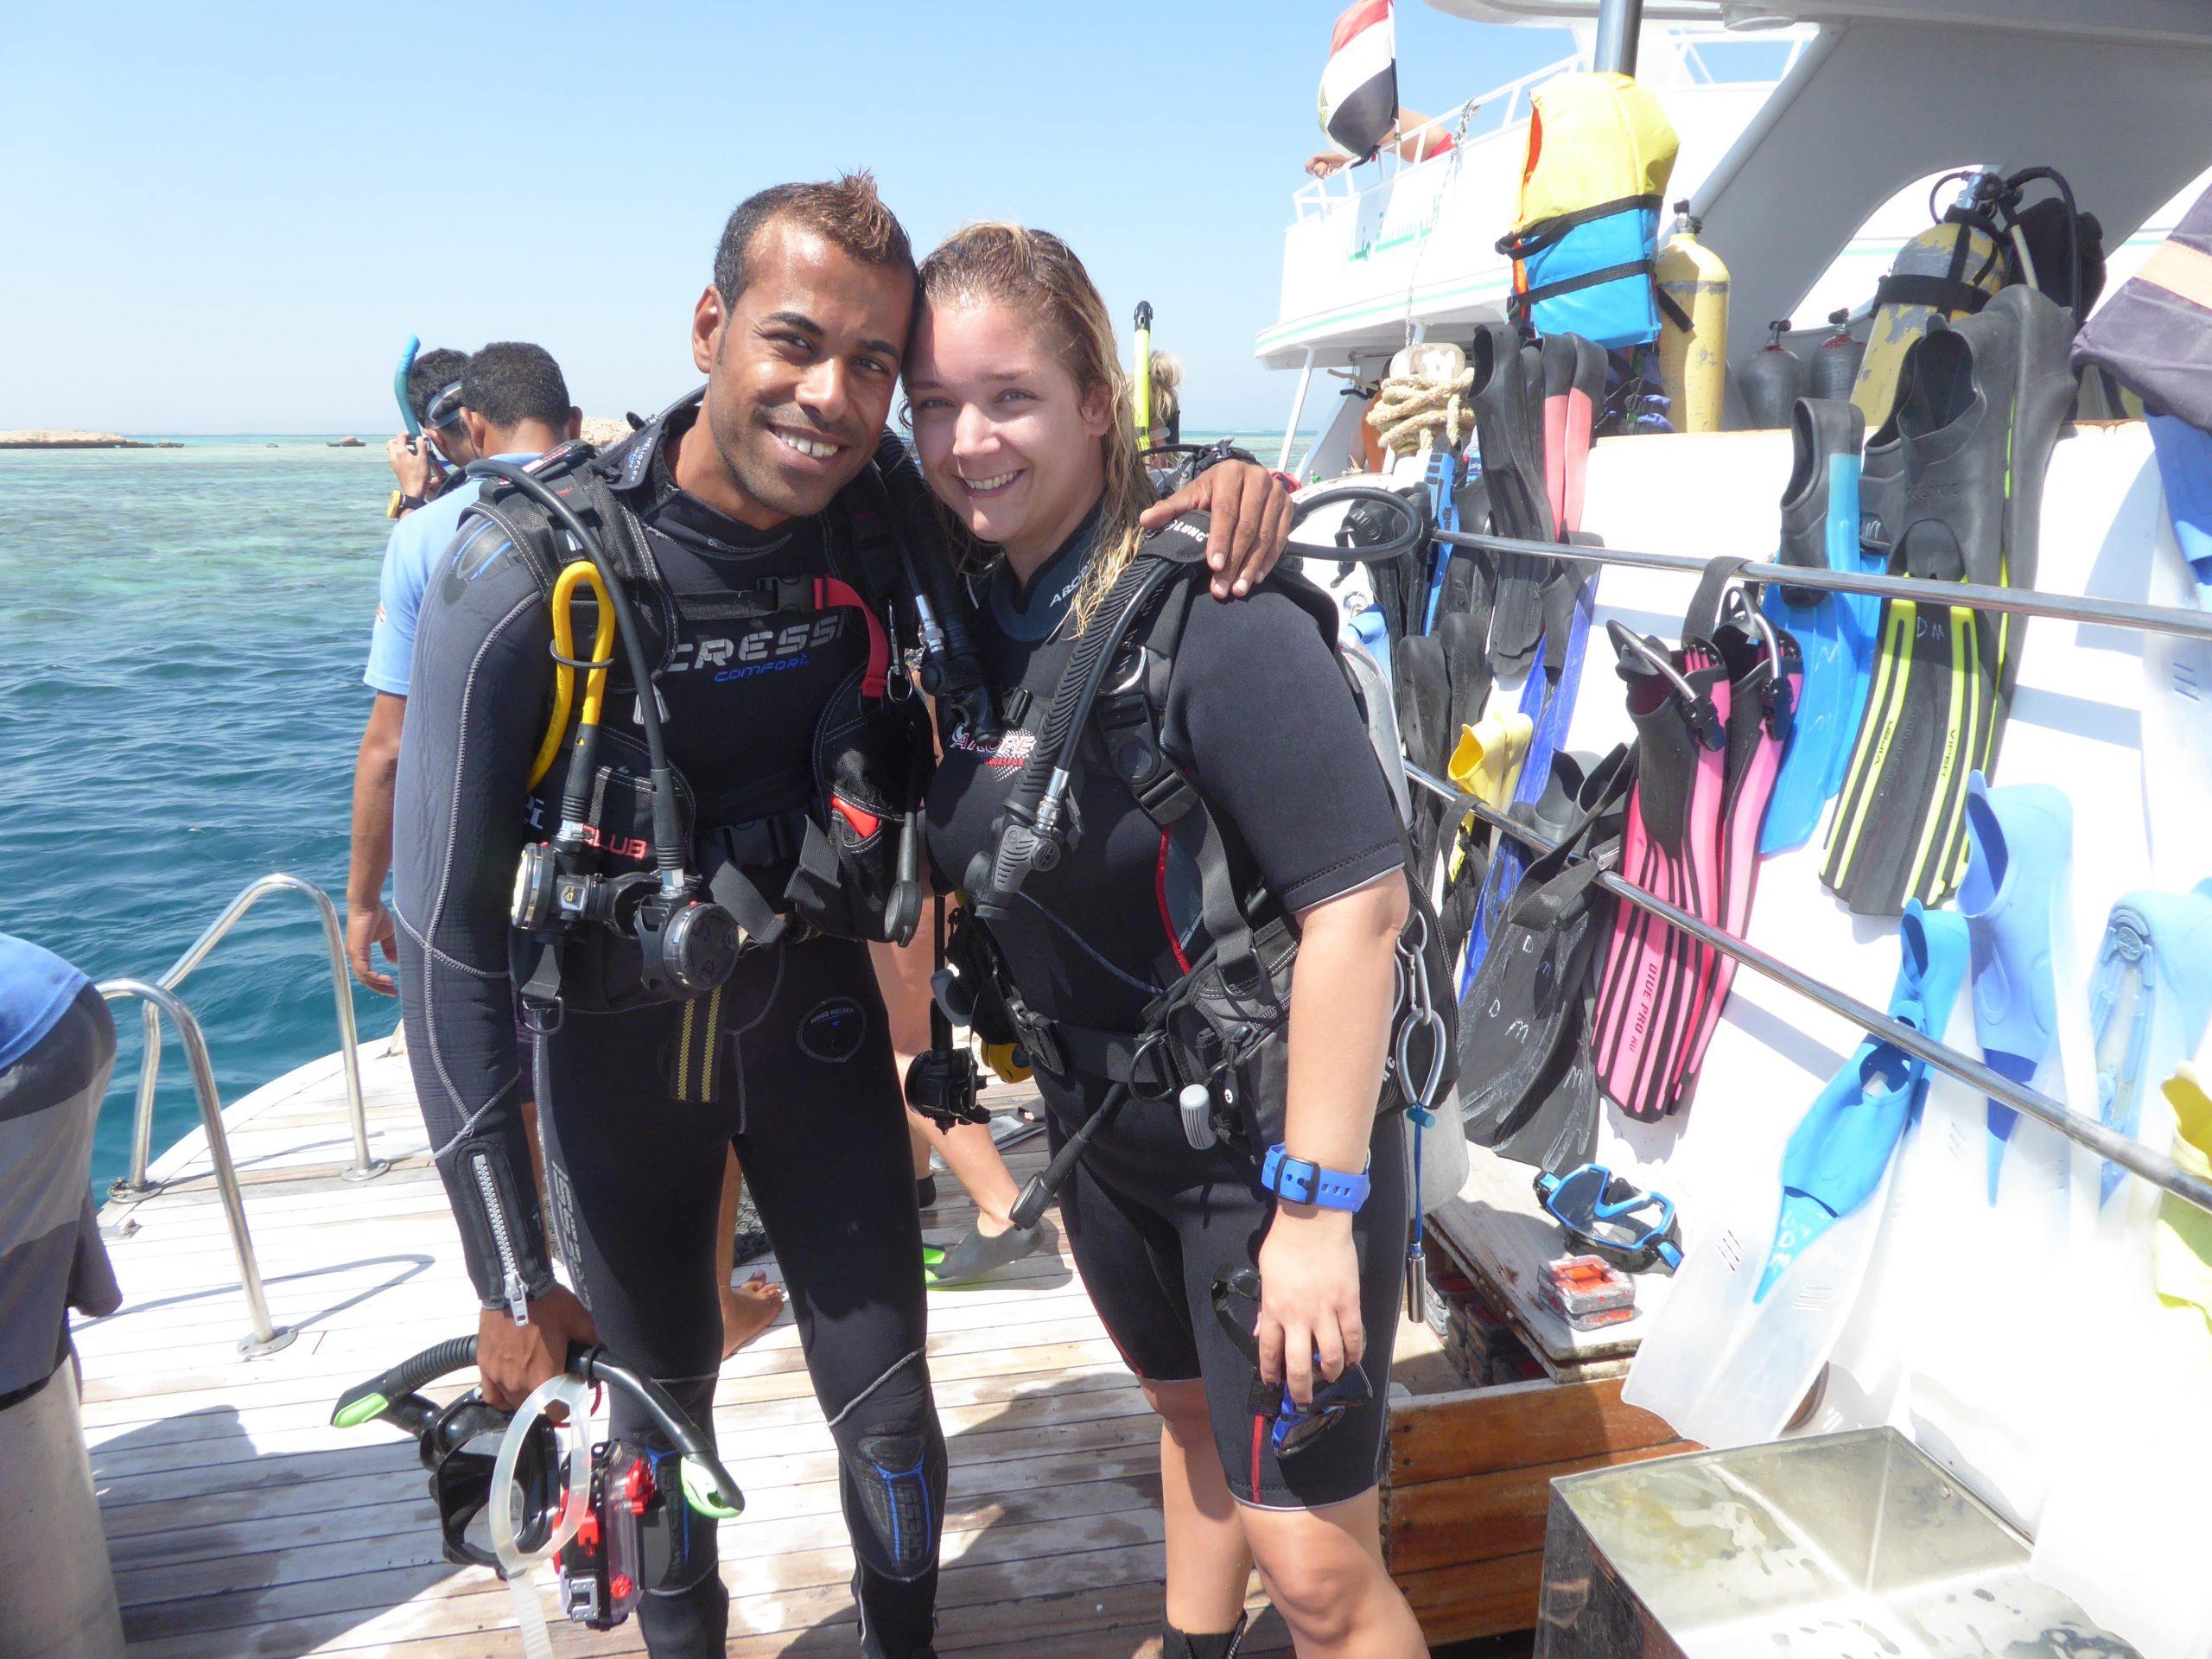 Seagate-Hurghada-Duiken-Scuba-Diving-Nederlandse-Duikcursus-Dutch-Dive-Course